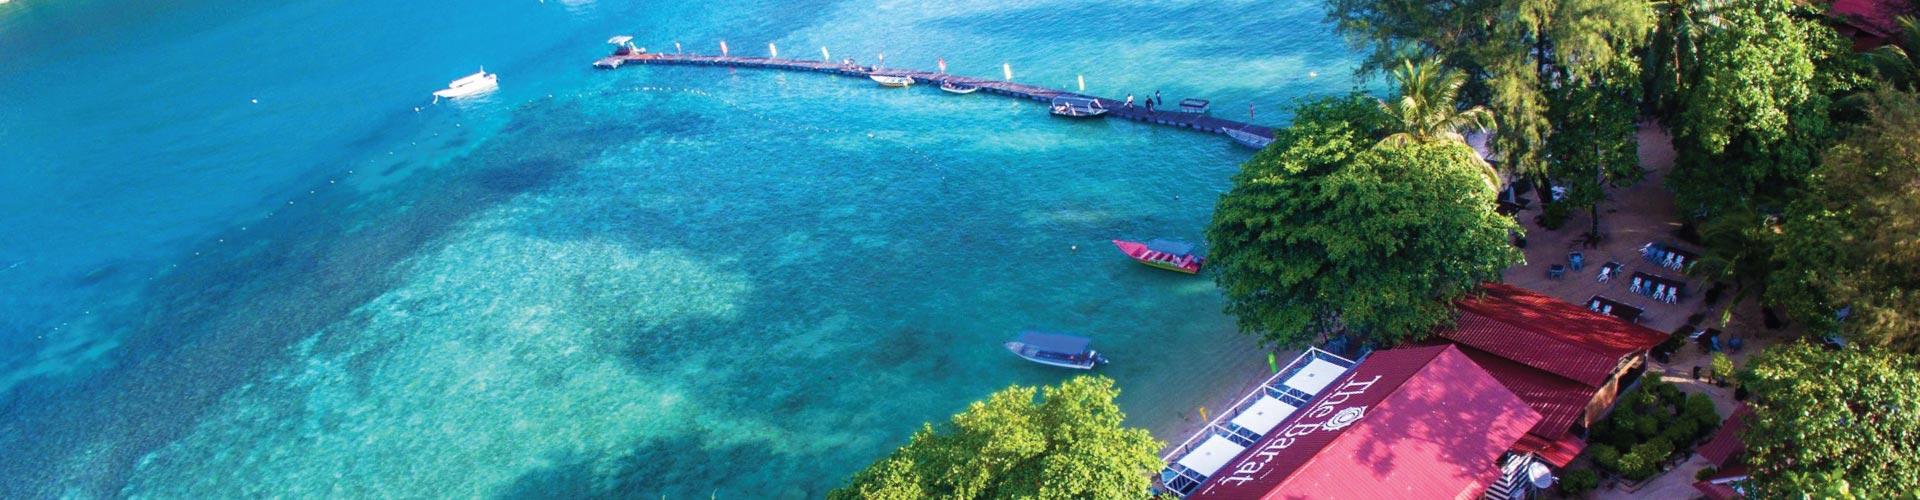 Perhentian Island Snorkeling Package @ The Barat Perhentian